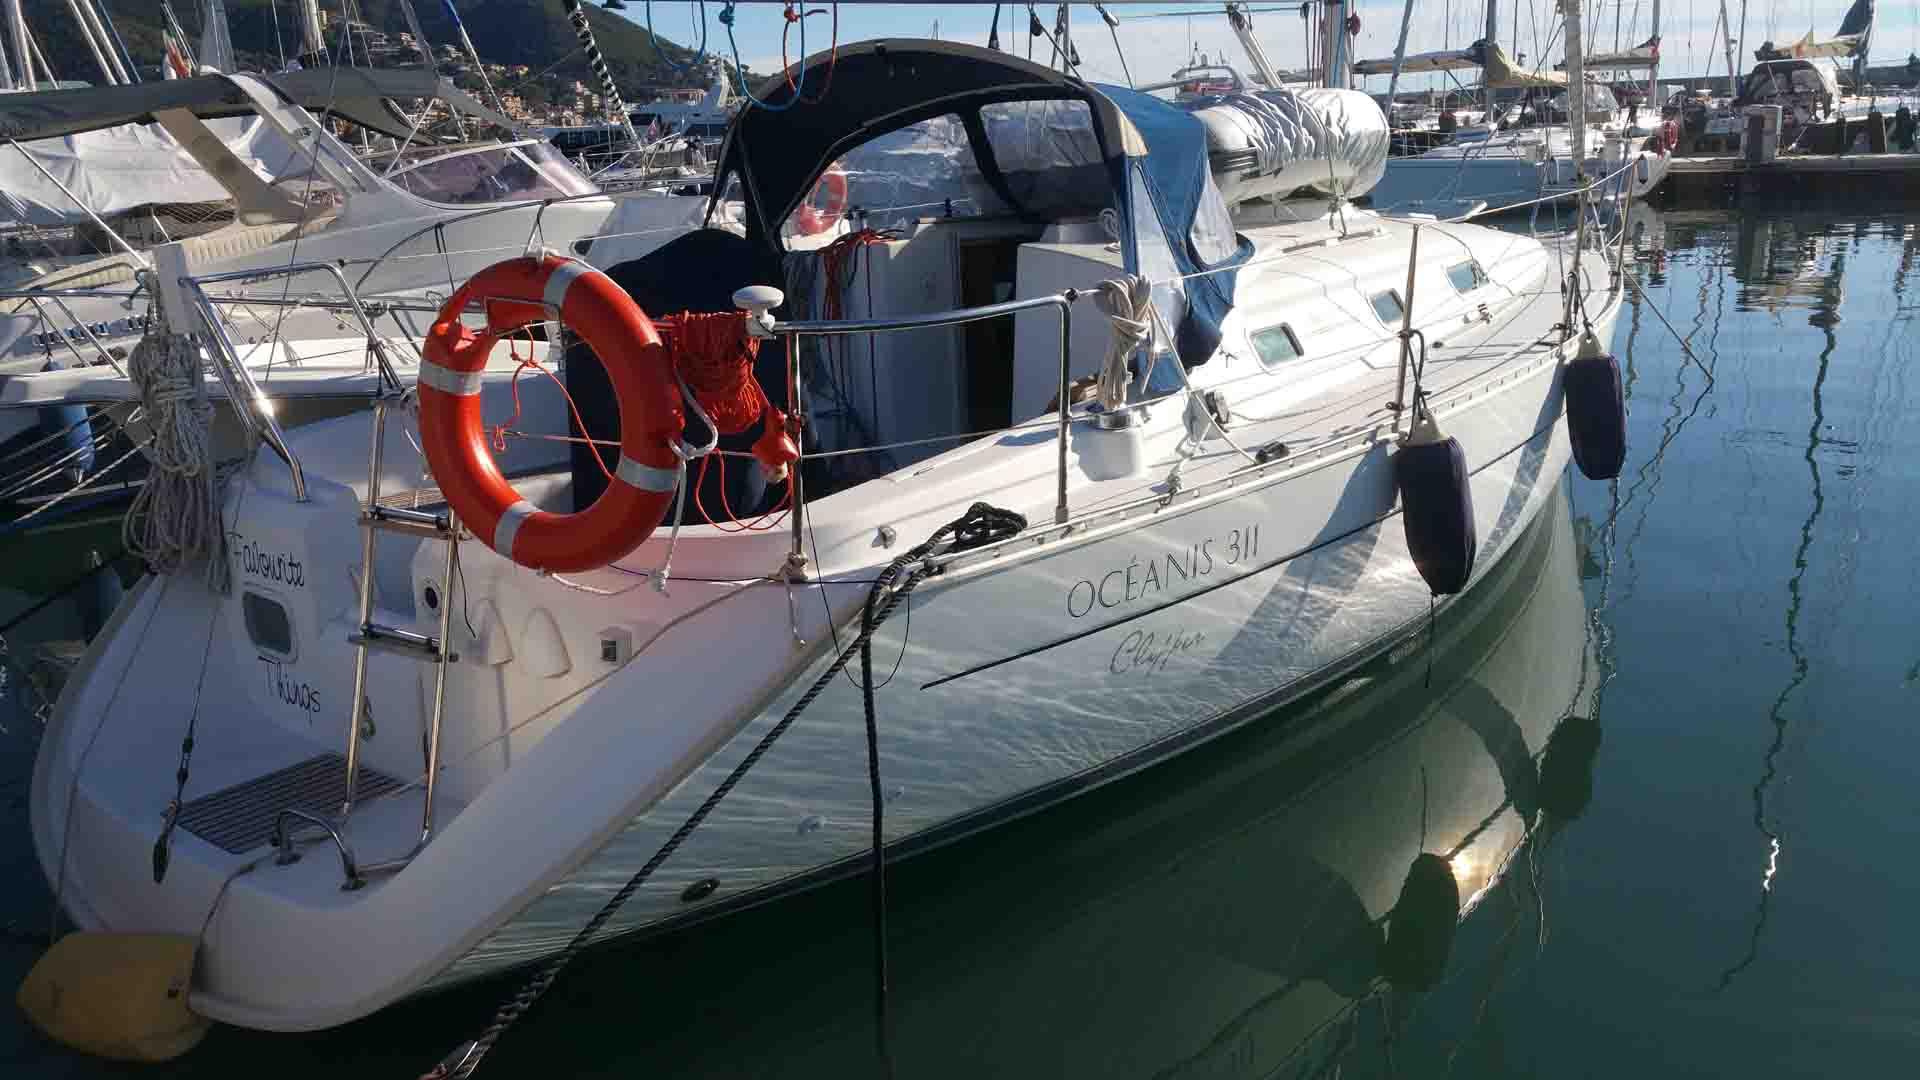 Doccia scampata Beneteau Oceanis 31.3 rollafiocco Marina Di Varazze esperienze di vela